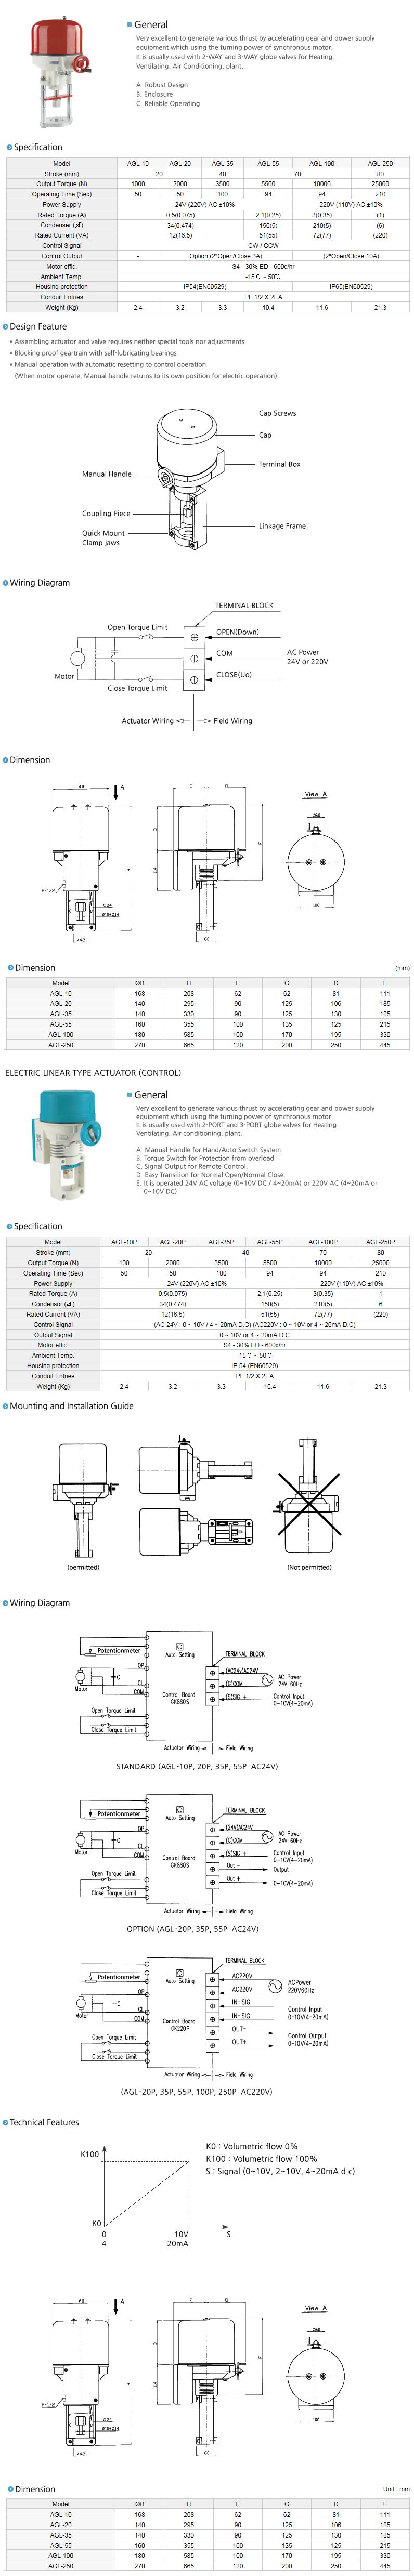 AUTOMA Electric Actuator (Linear Type Actuator) AQL/AGL Series 1